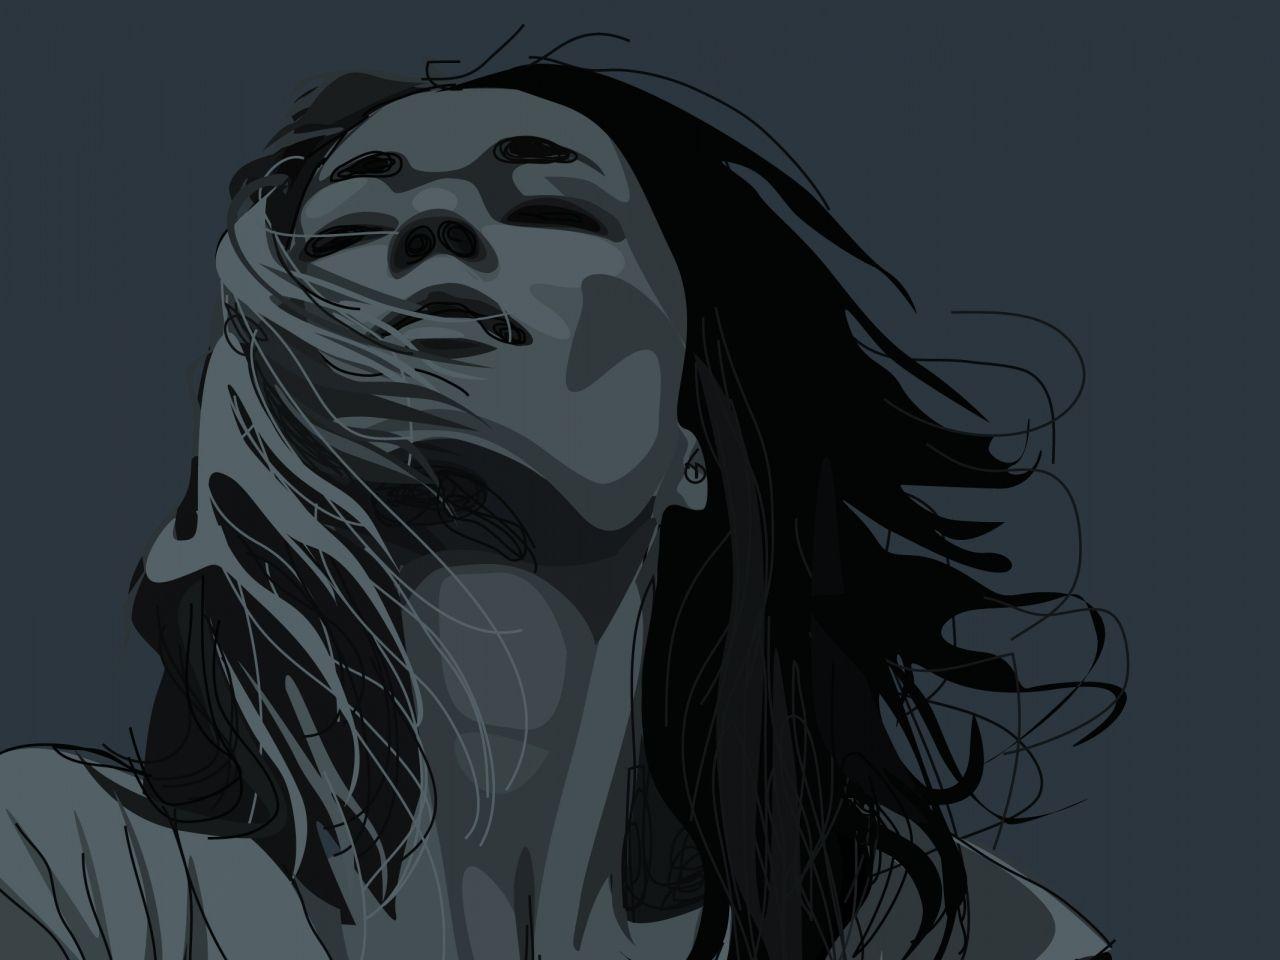 X Vektor Wallpaper Download Gambar Potret Wallpaper Gadis Vektor Rambut Latar Belakang Wajah Vektor Ilustrasi Ana Walls